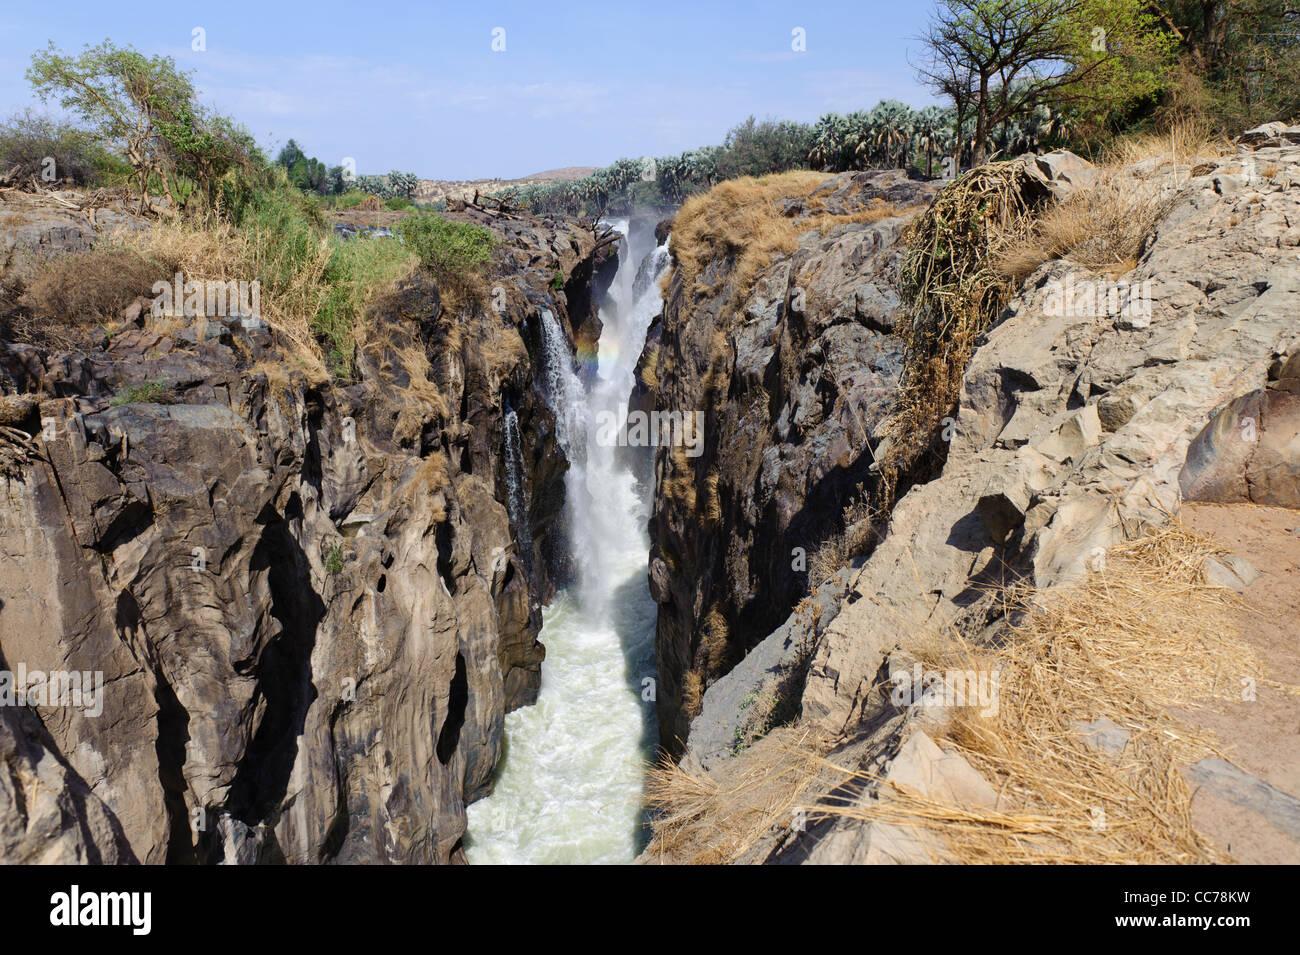 Epupa Falls in November. Kunene Region Kaokoland, Namibia. - Stock Image